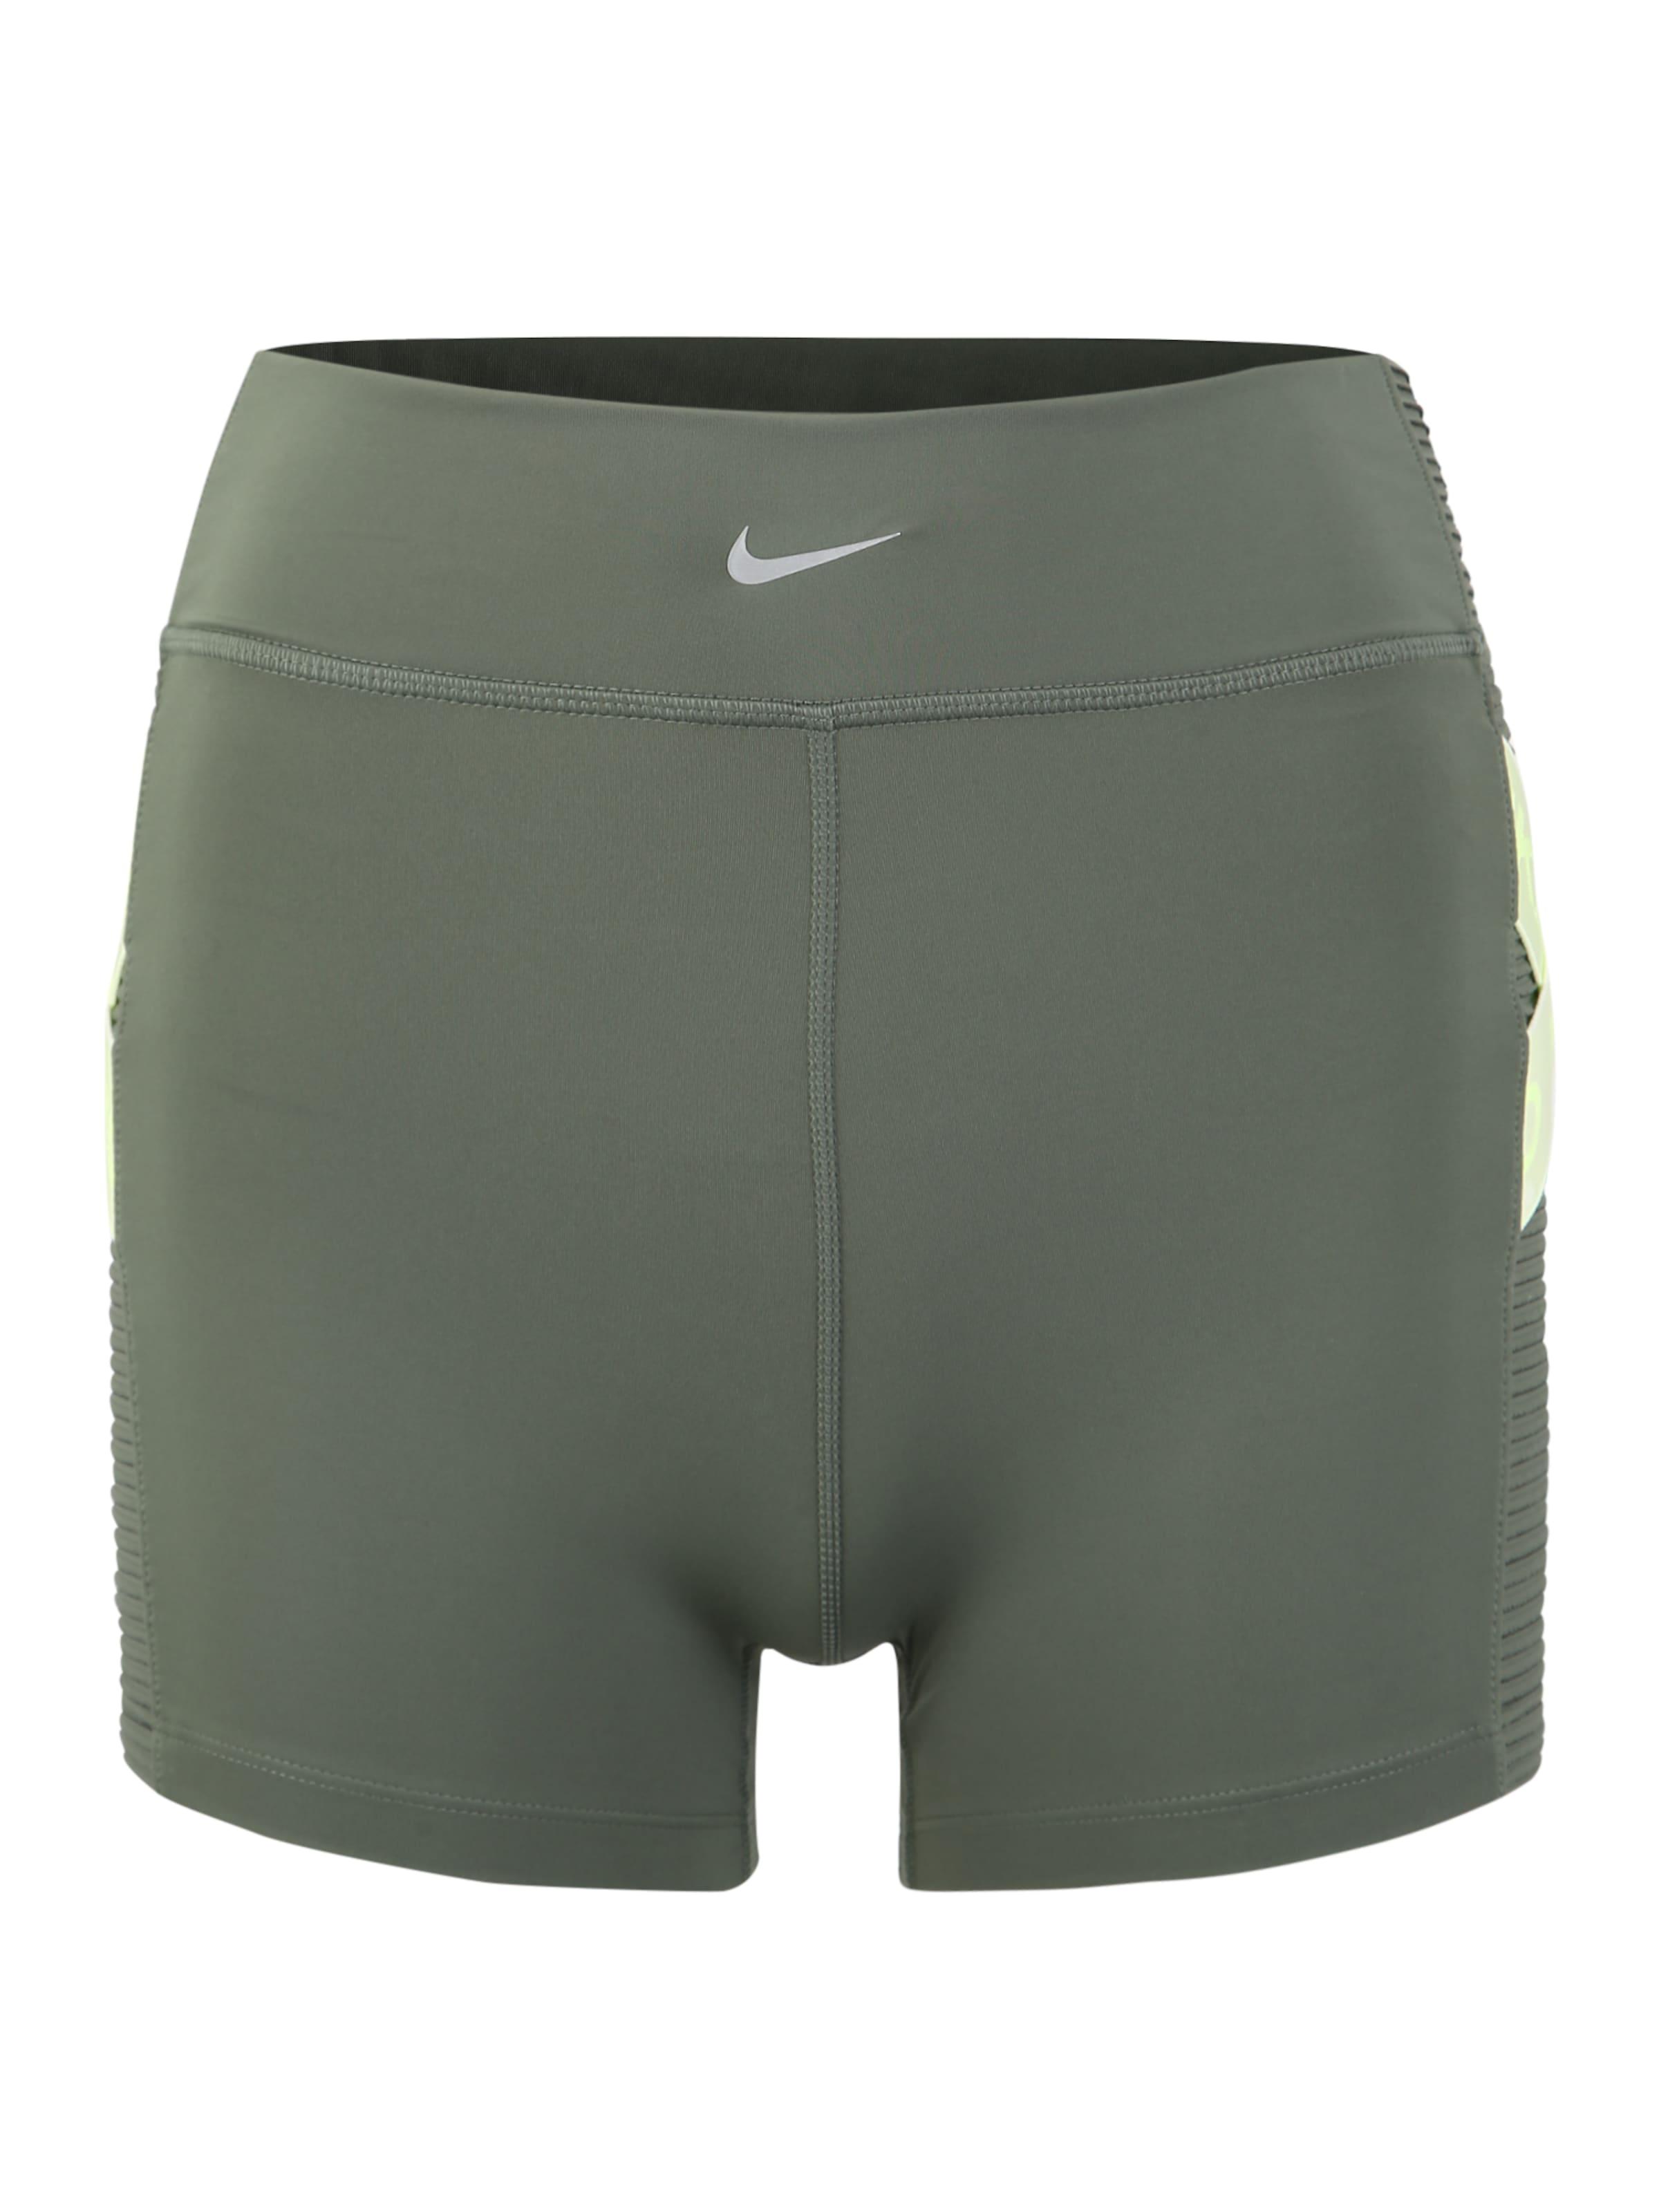 Np In Capsule 3inch Short Sportshorts Ardp' 'w Nike OlivSchwarz P0wkX8nO